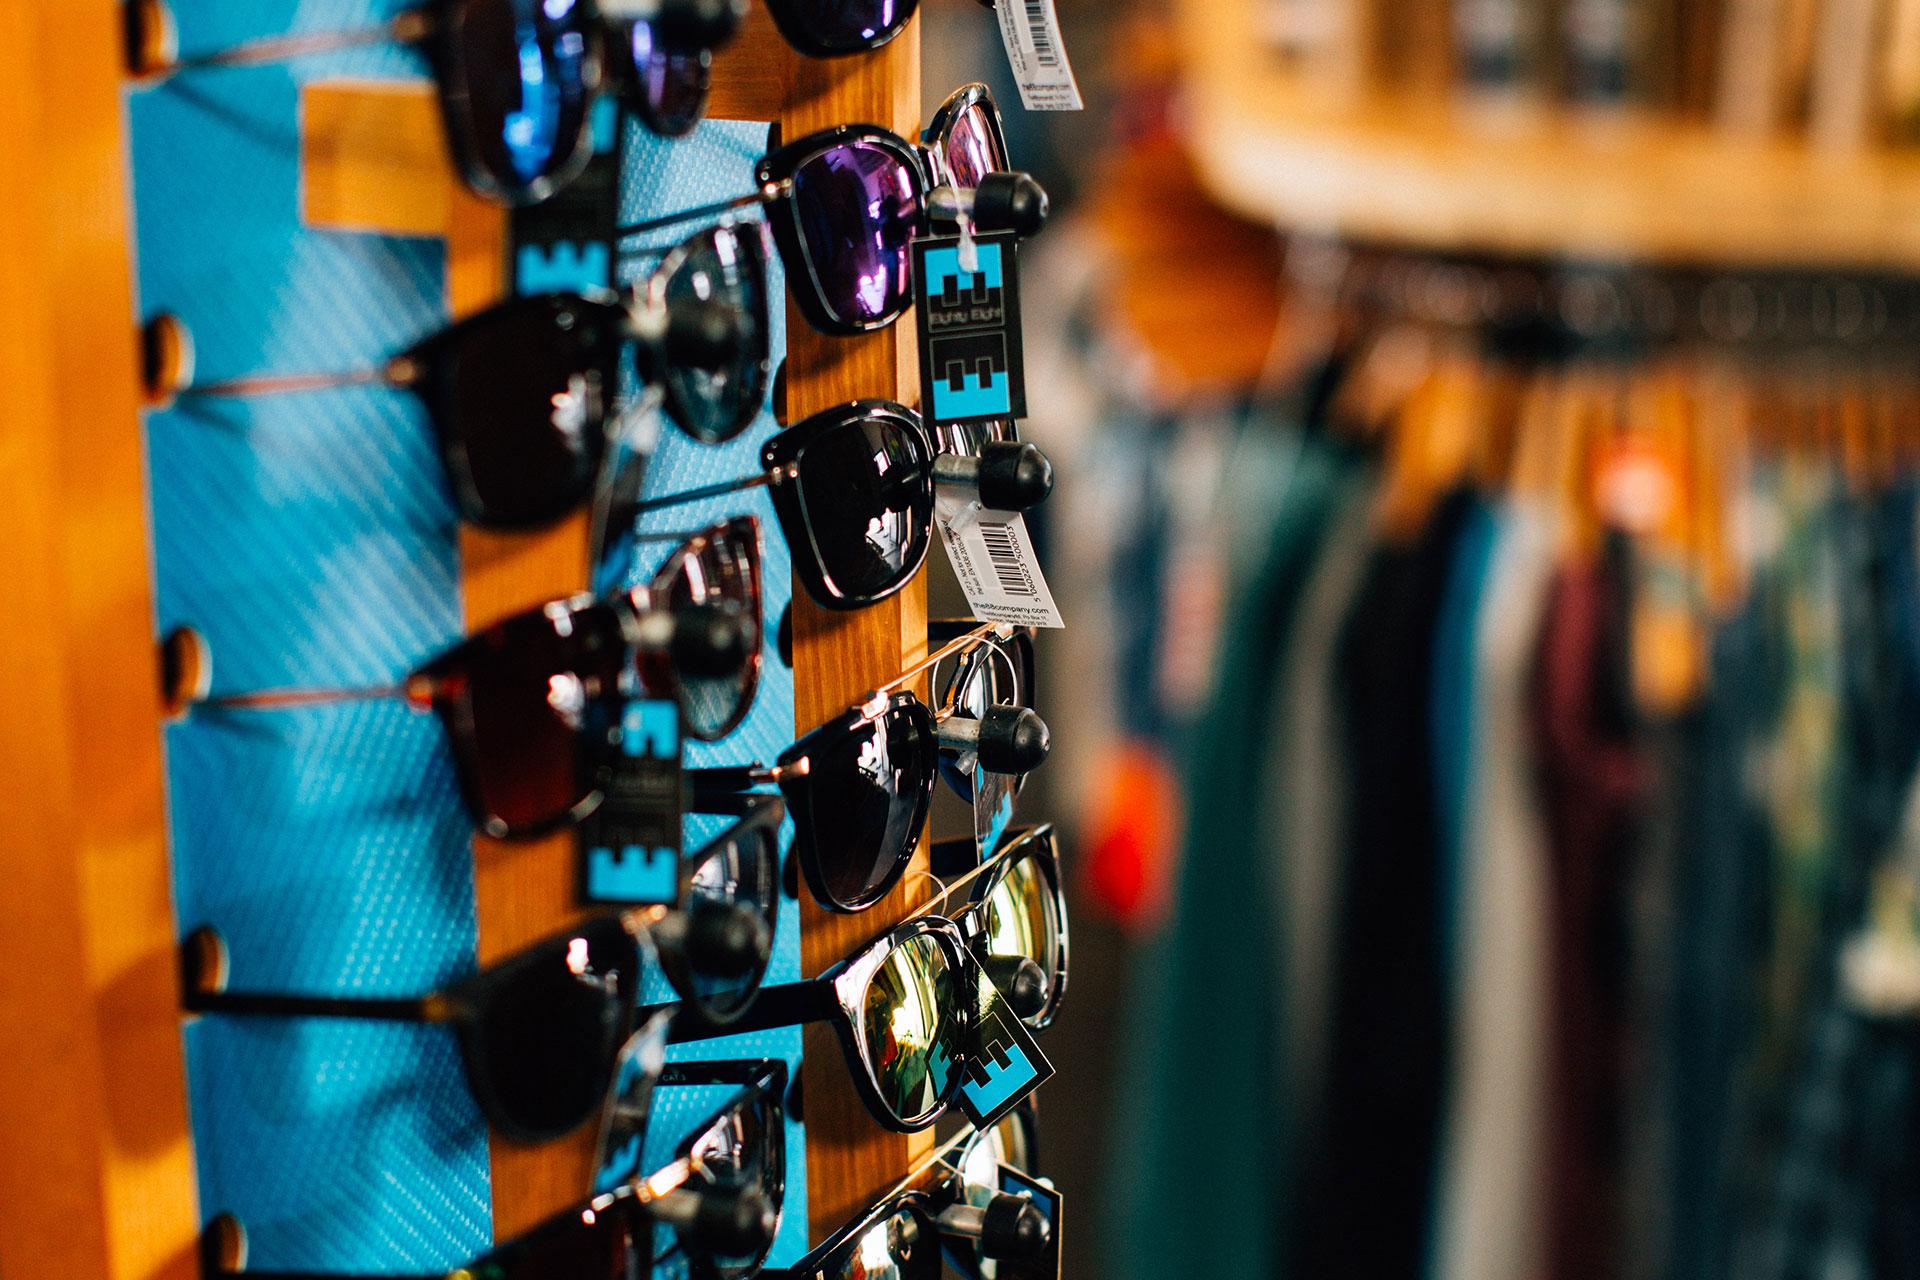 surf-shop-jersey-sunglasses